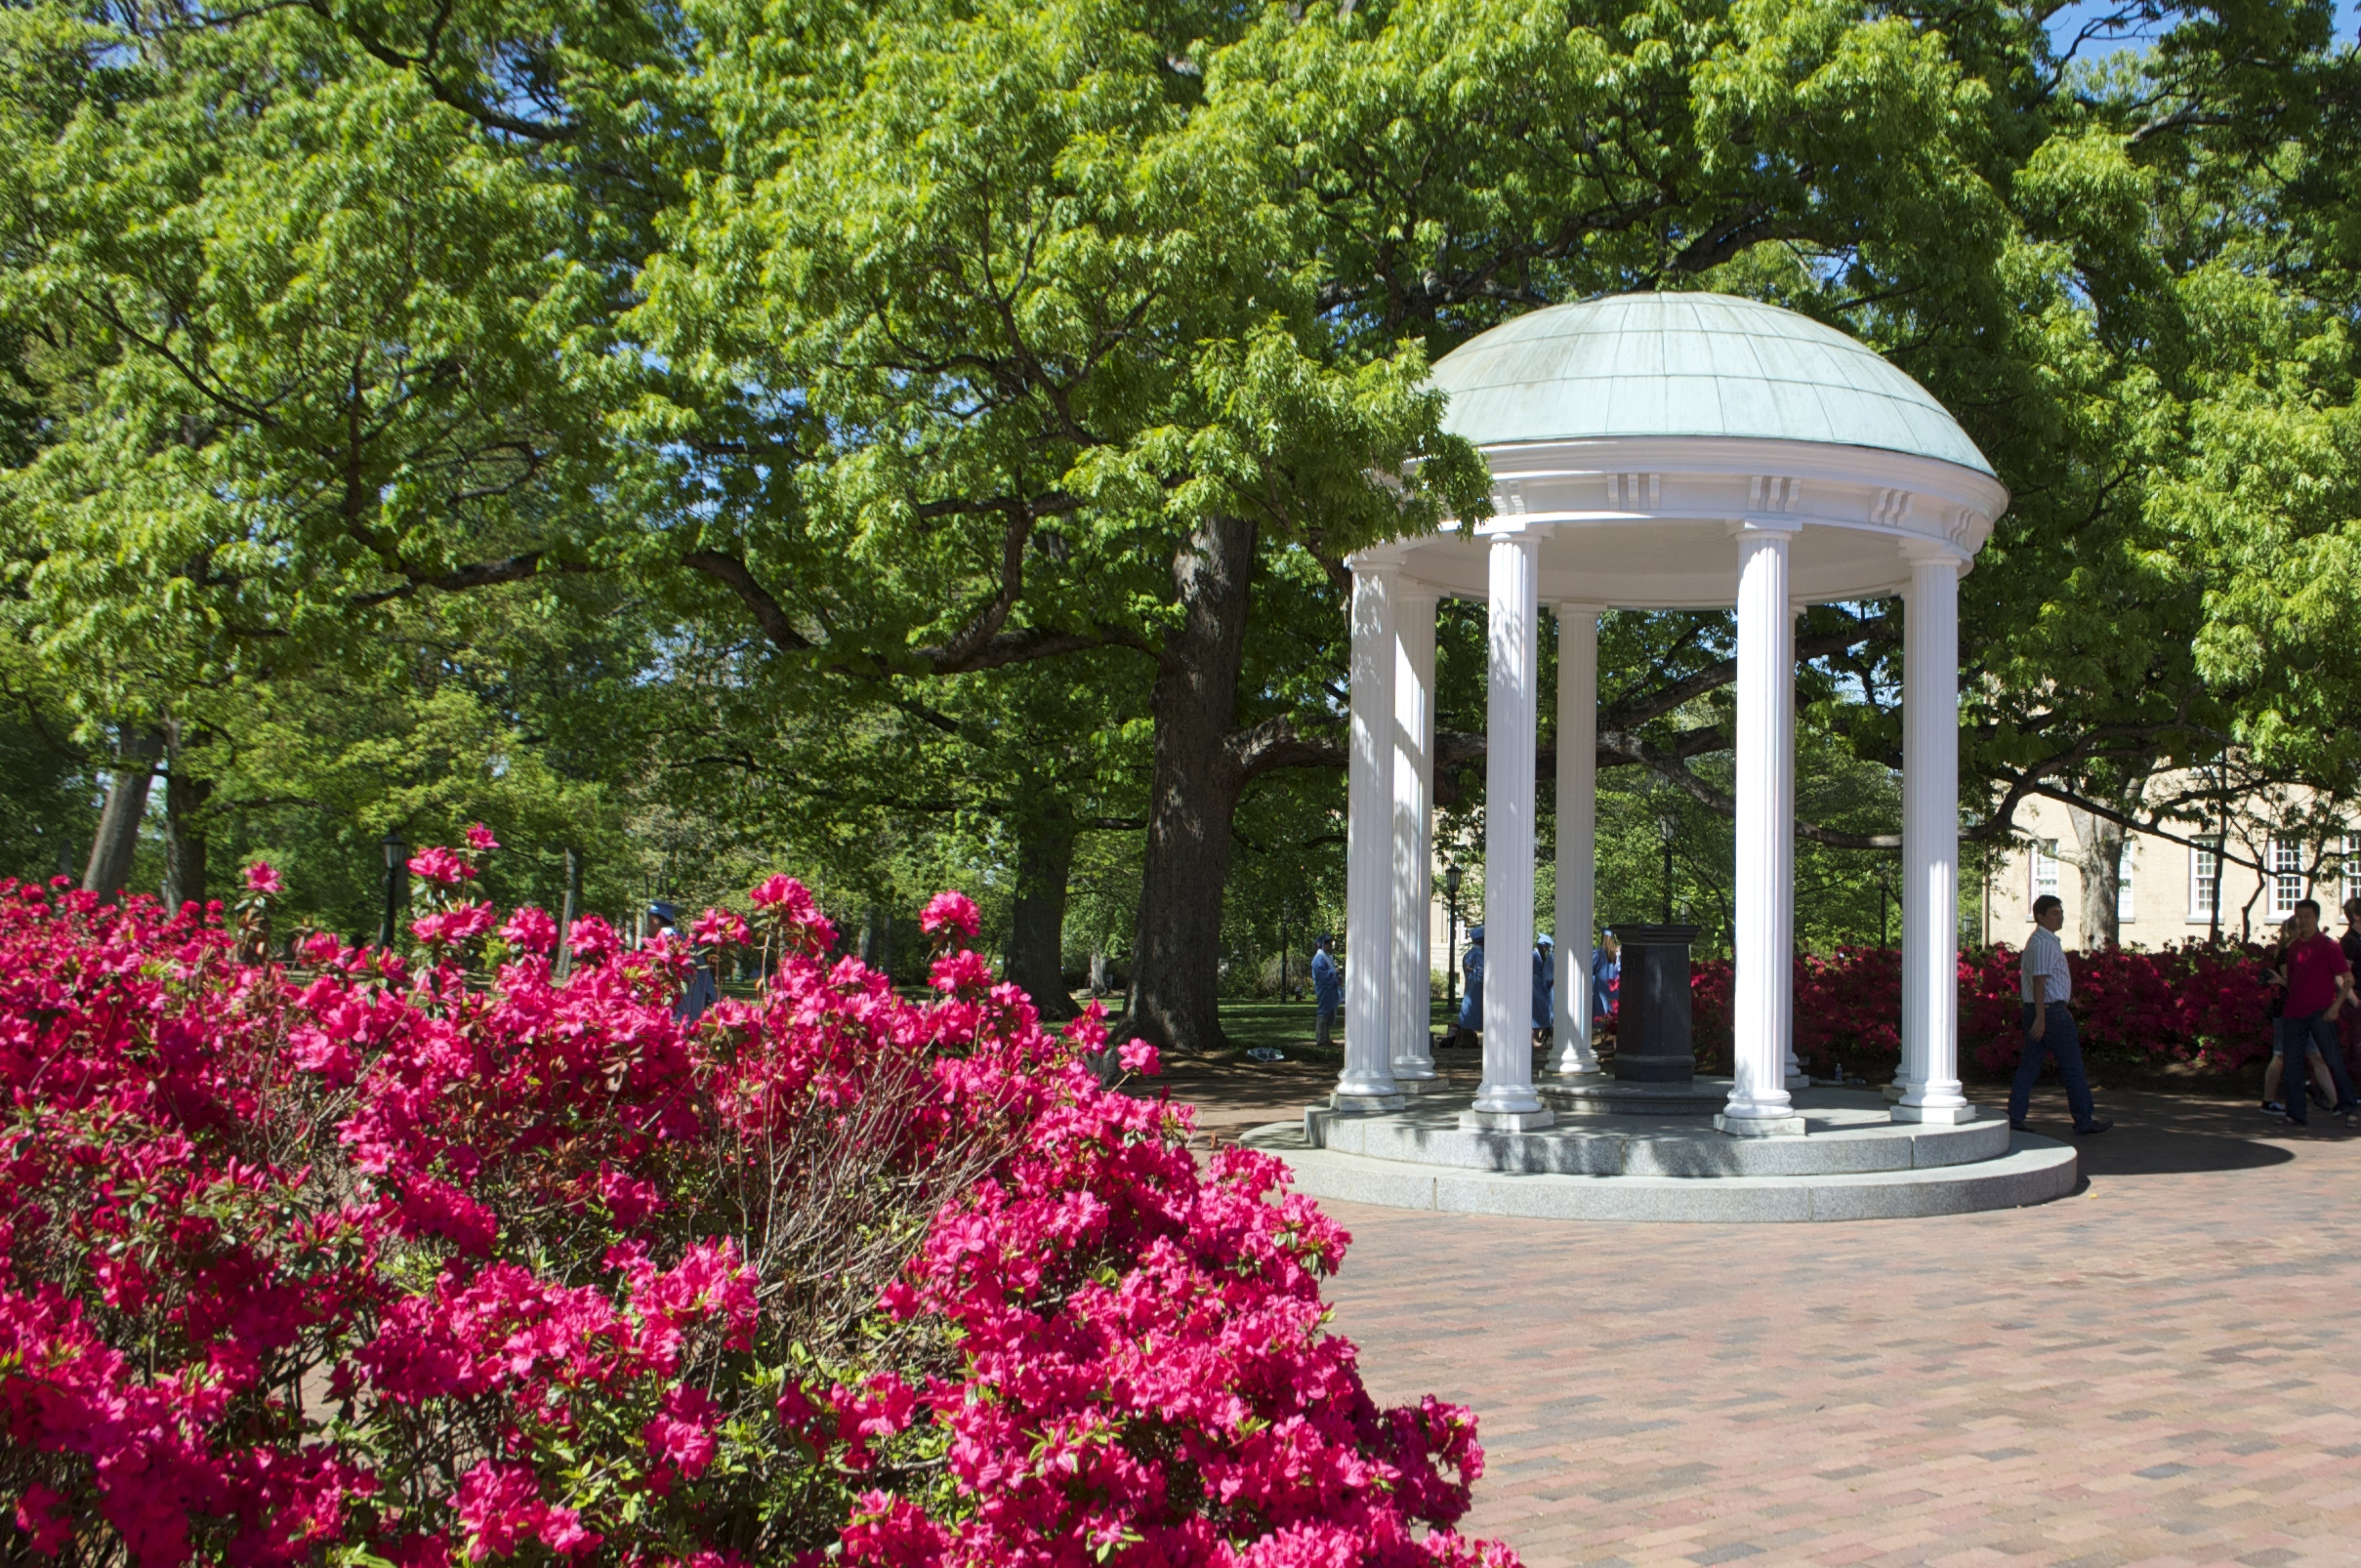 University of North Carolina at Chapel Hill Well